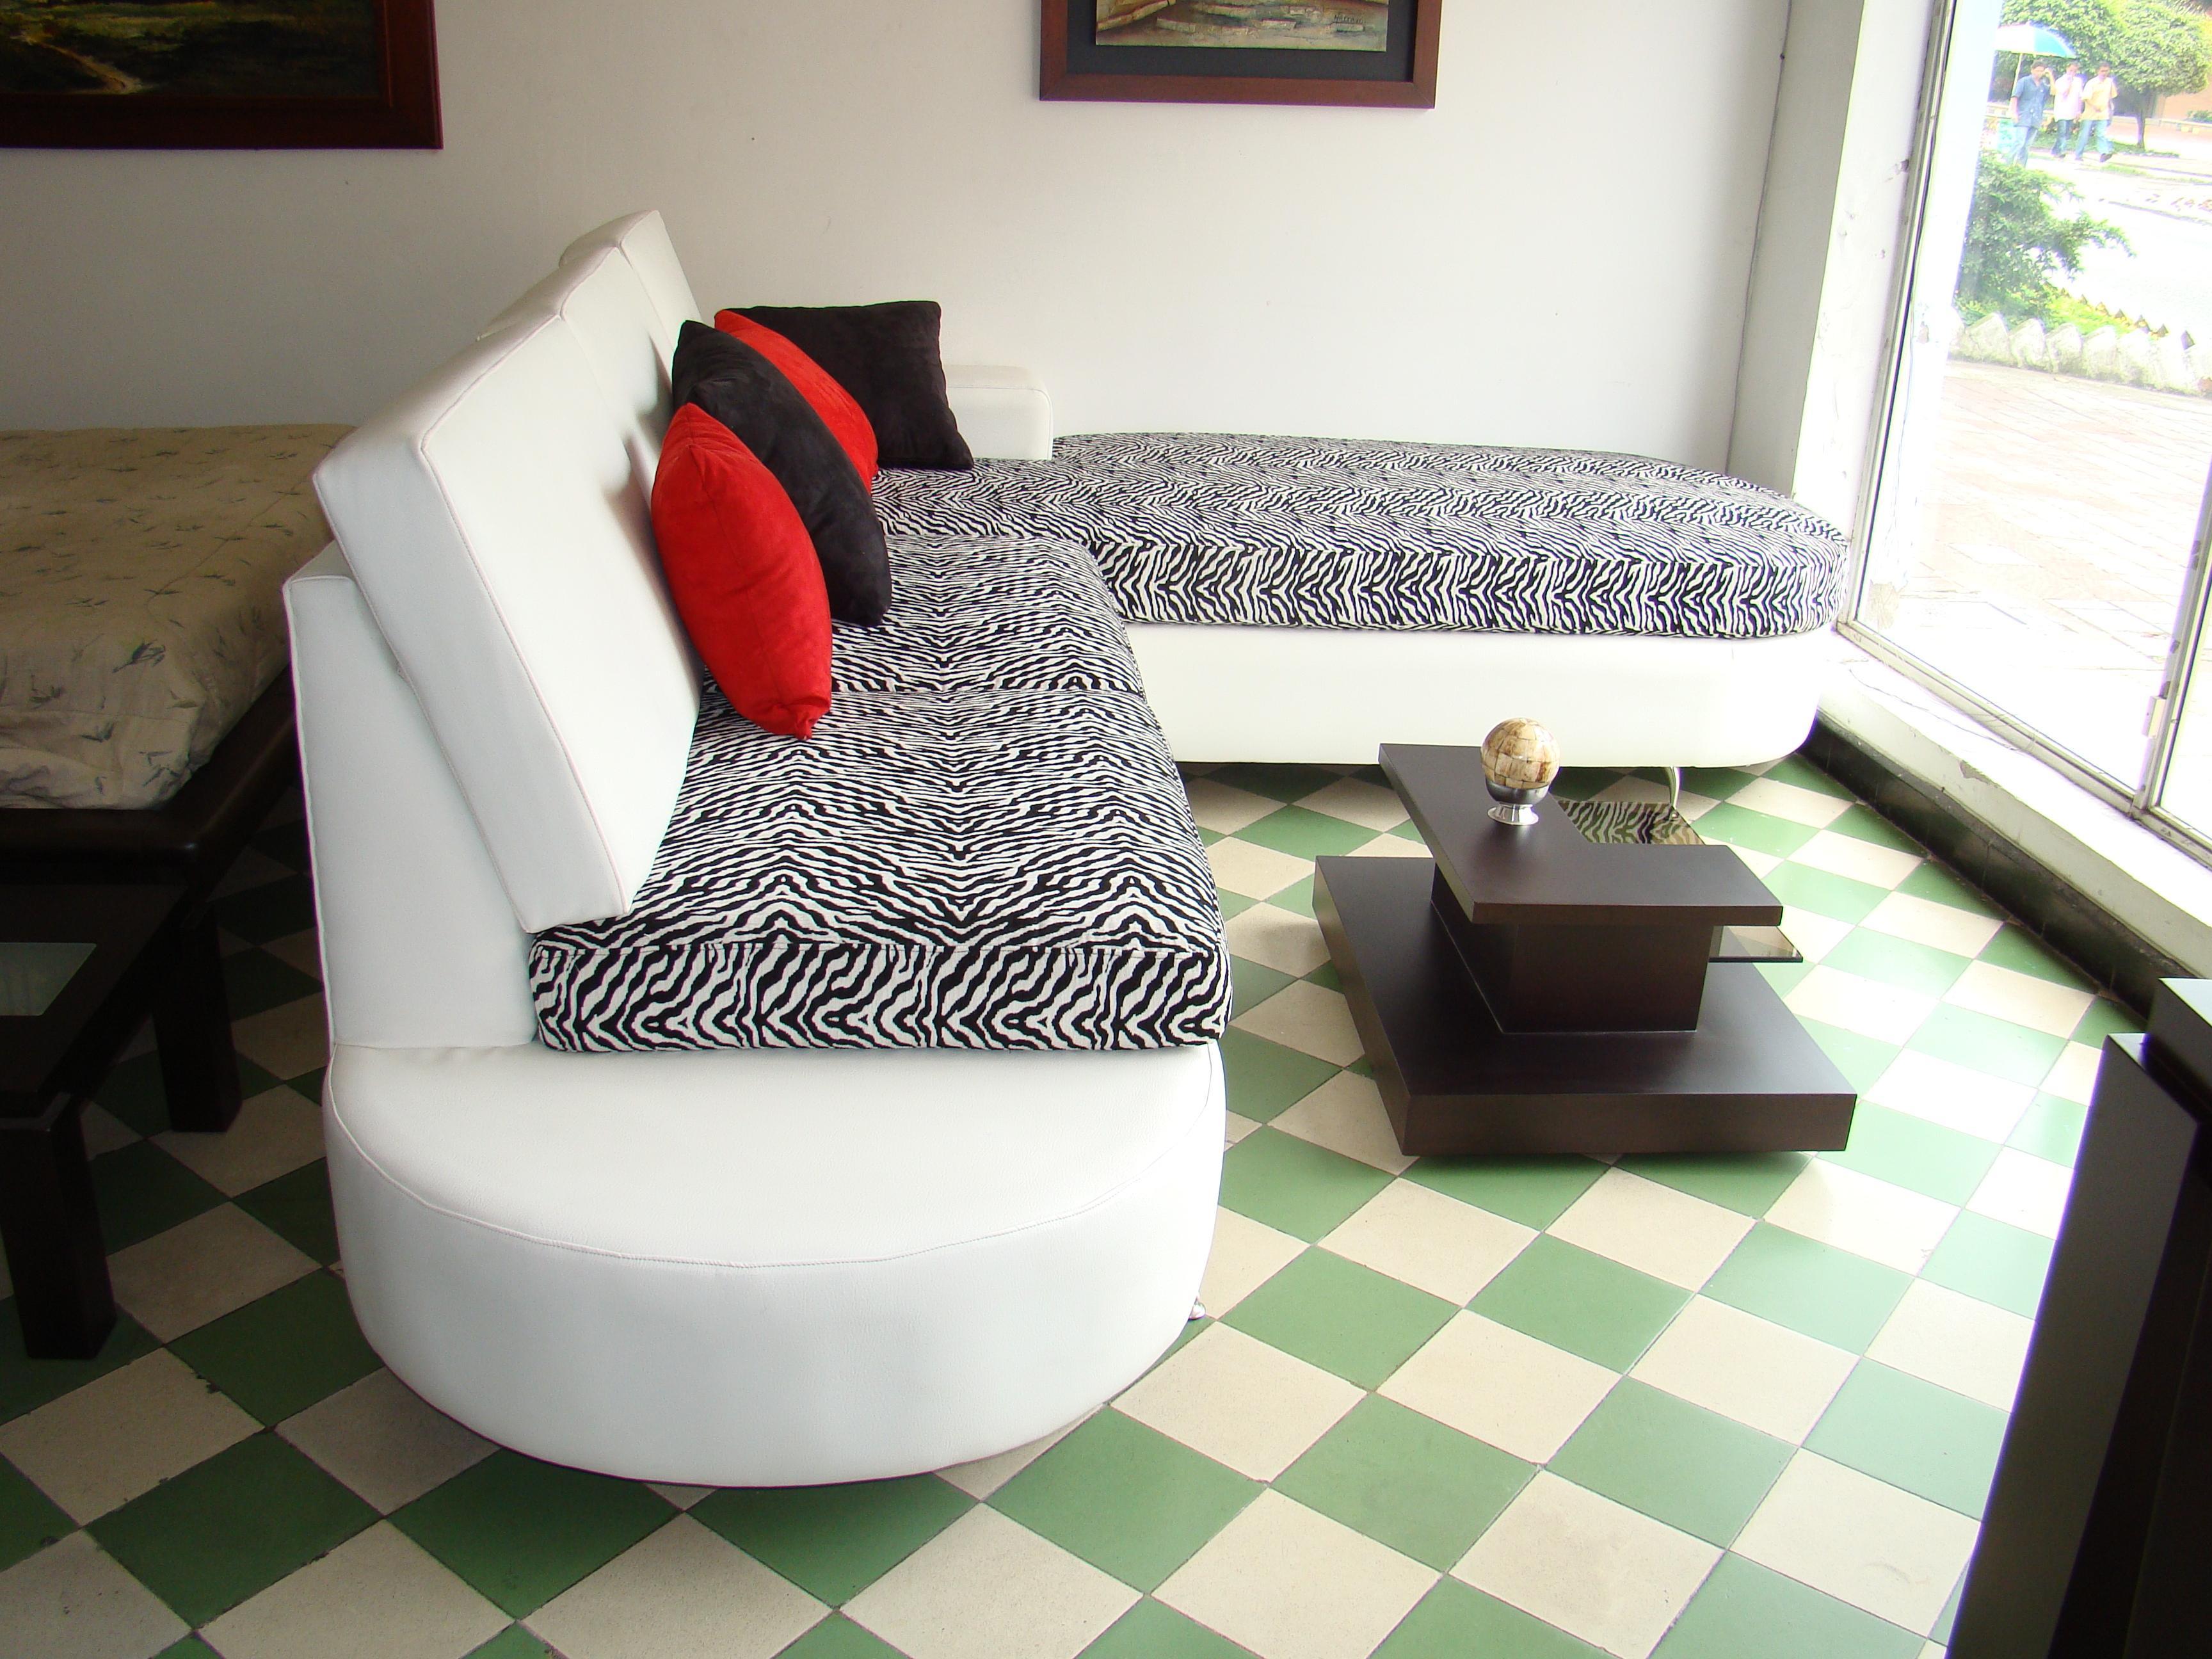 Muebles modercol catalogo de productos for Catalogo de muebles